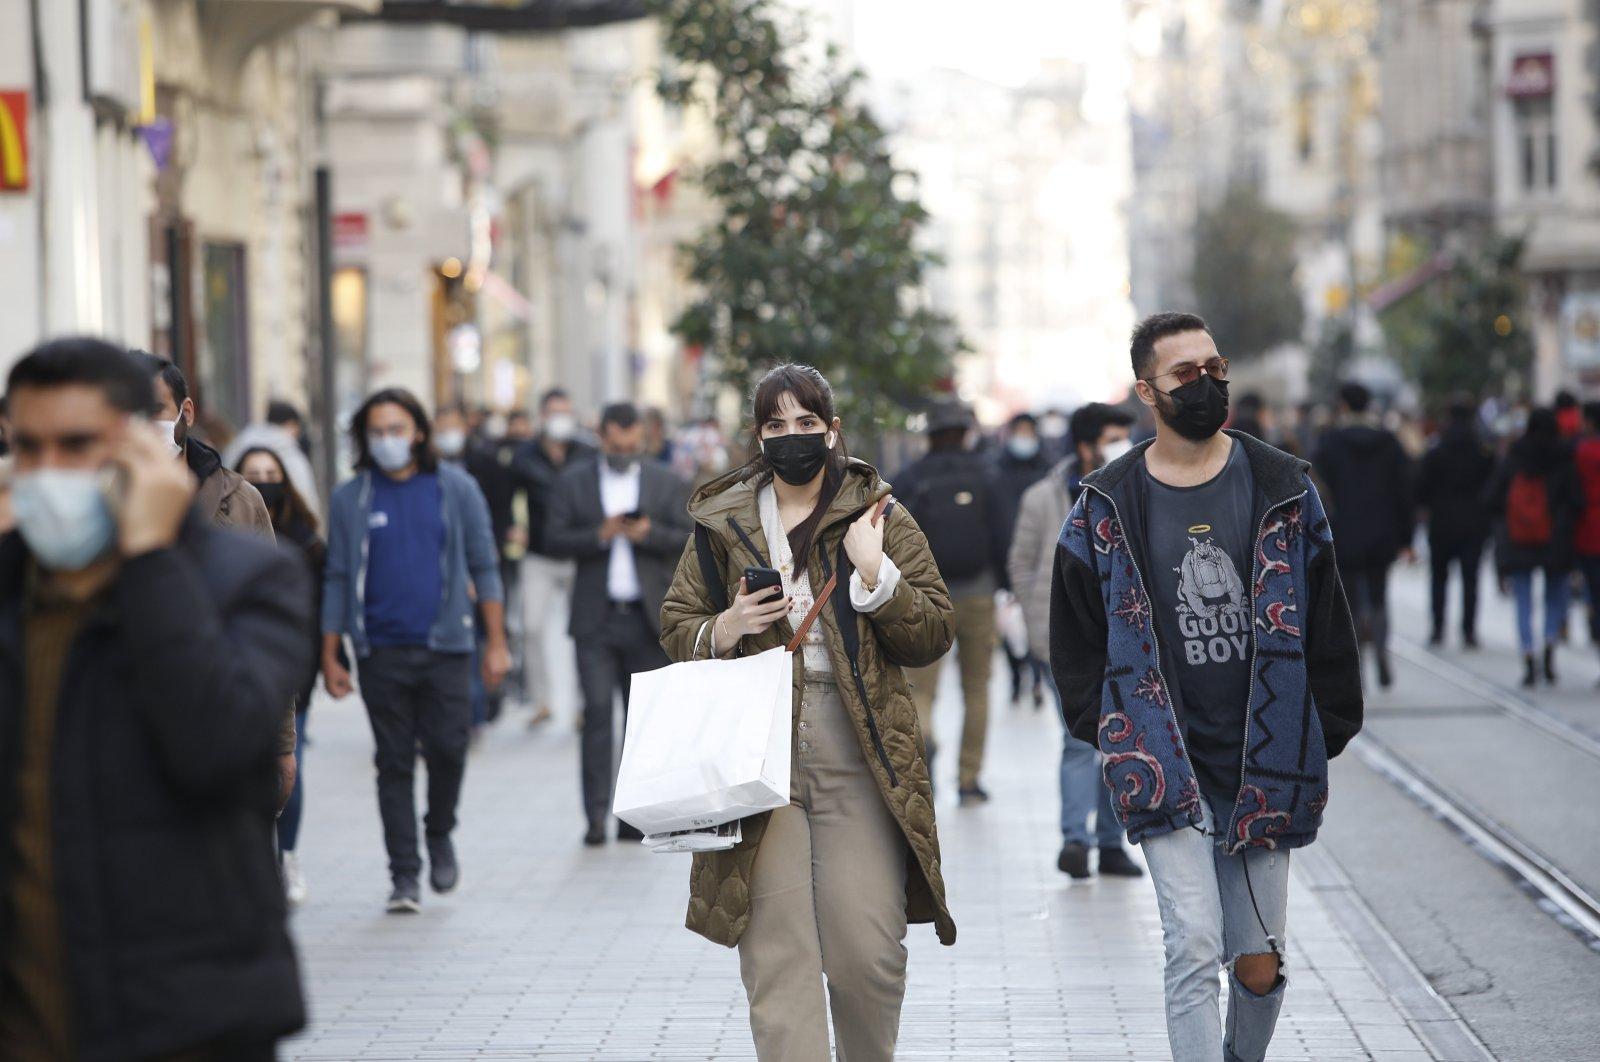 People walk in a popular shopping destination, İstiklal Avenue, in Istanbul, Turkey, Dec. 13, 2020. (Photo by Murat Şengül)